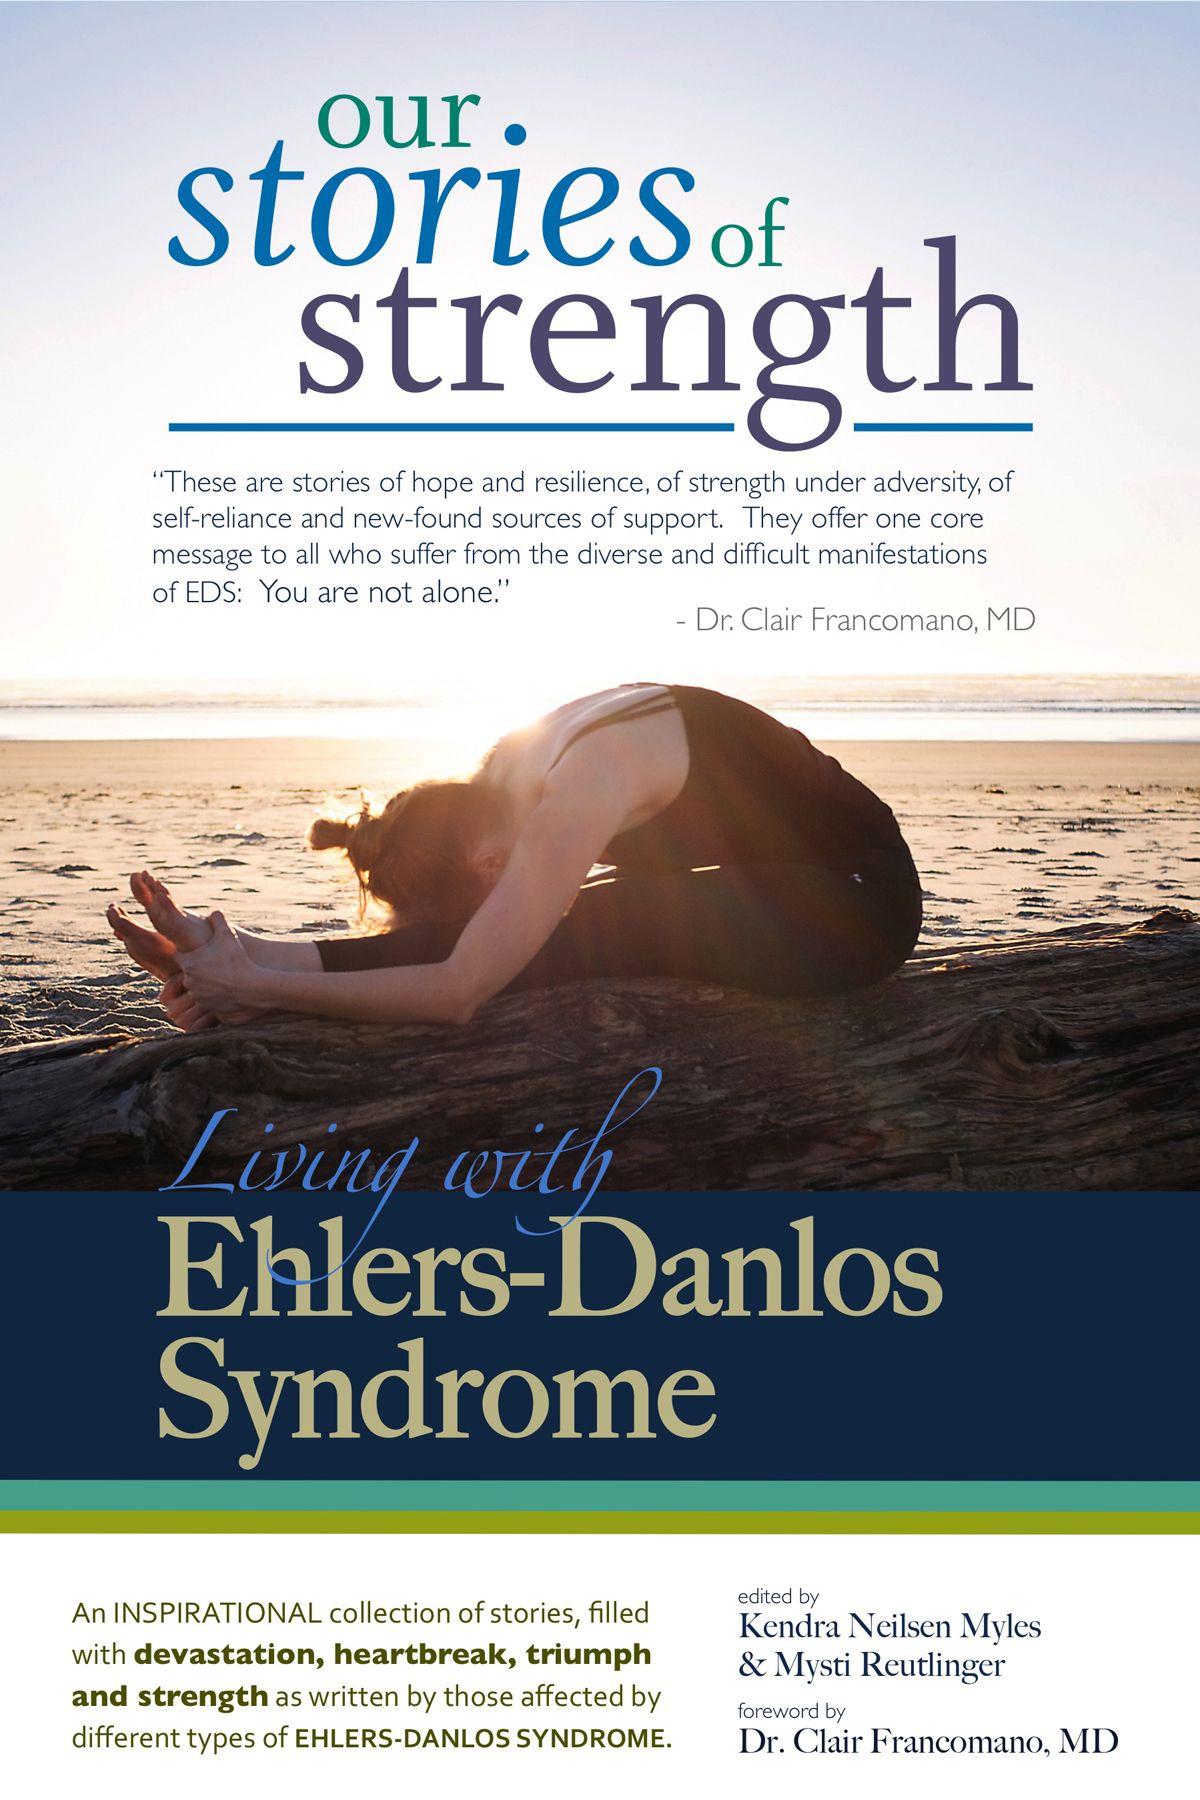 Syndrome Danlos Vascular Ehlers